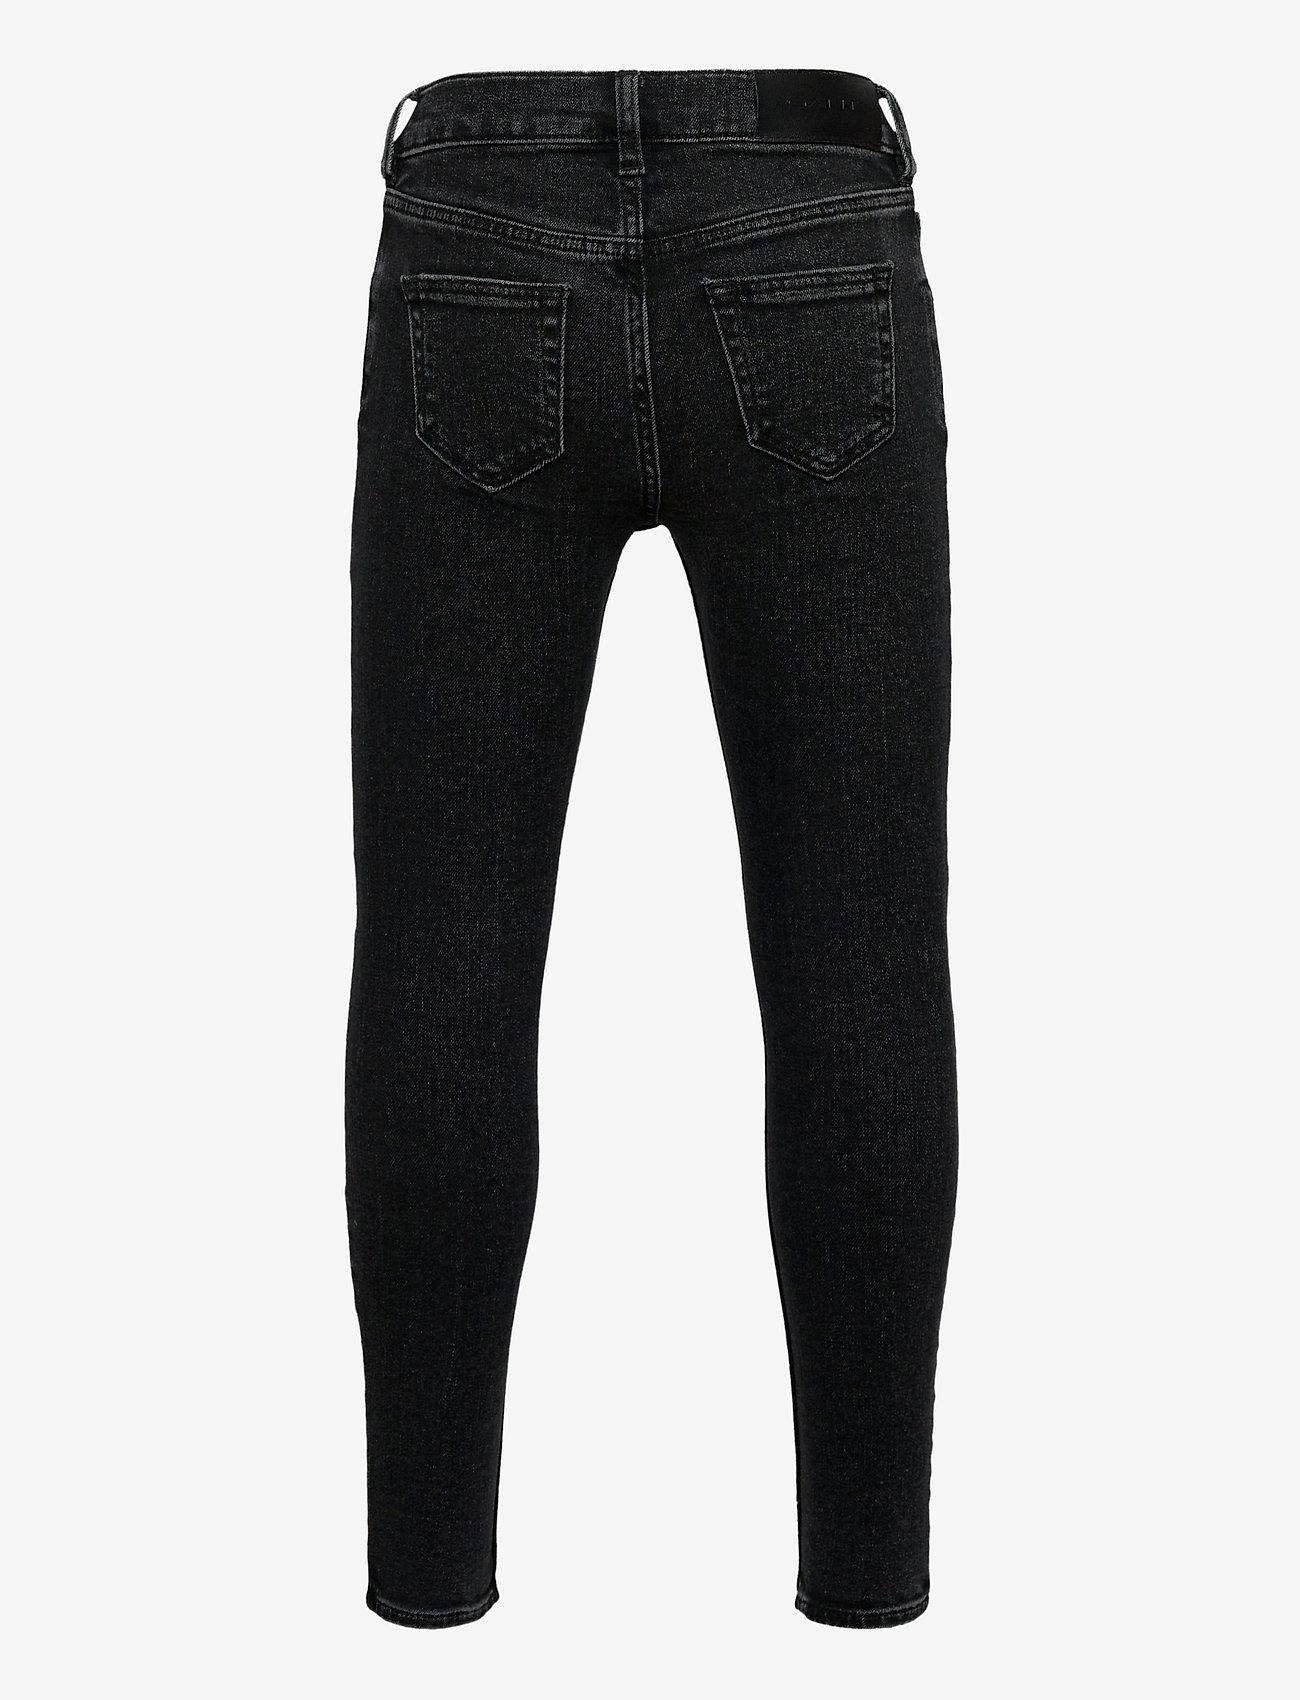 GANT - GANT SKINNY JEANS - jeans - black raw - 1